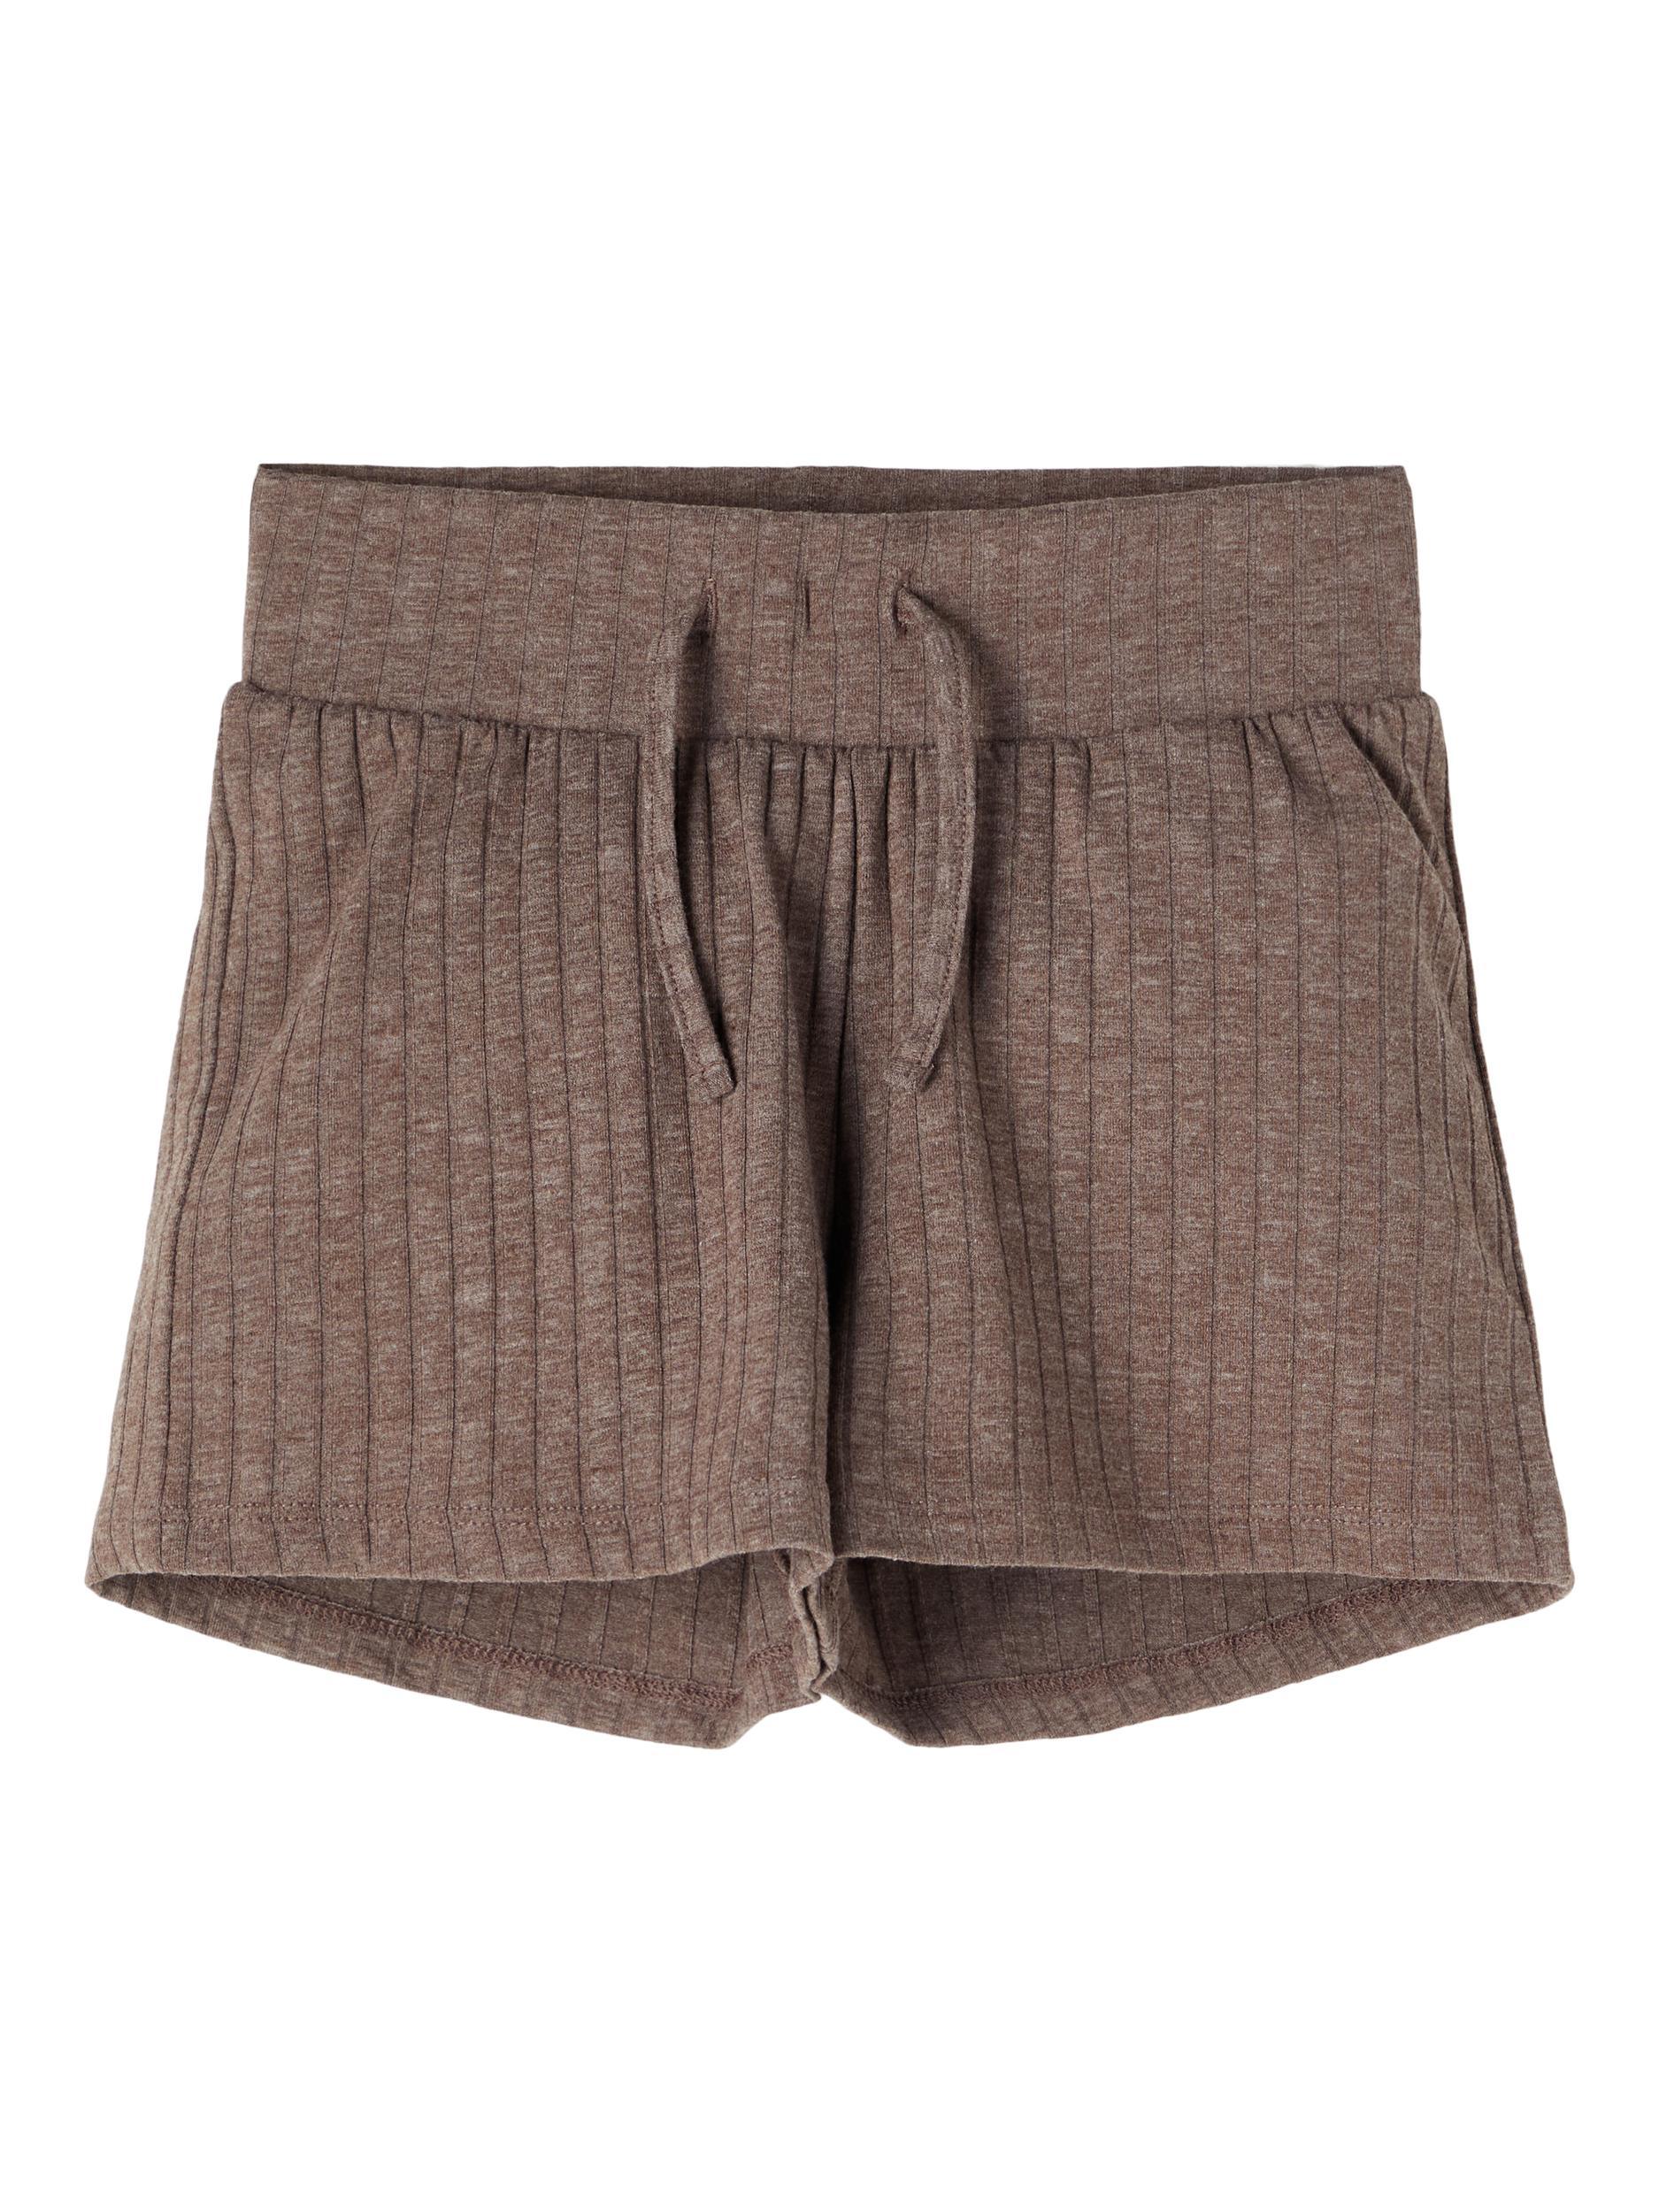 Name It Nola shorts, deep taupe, 116